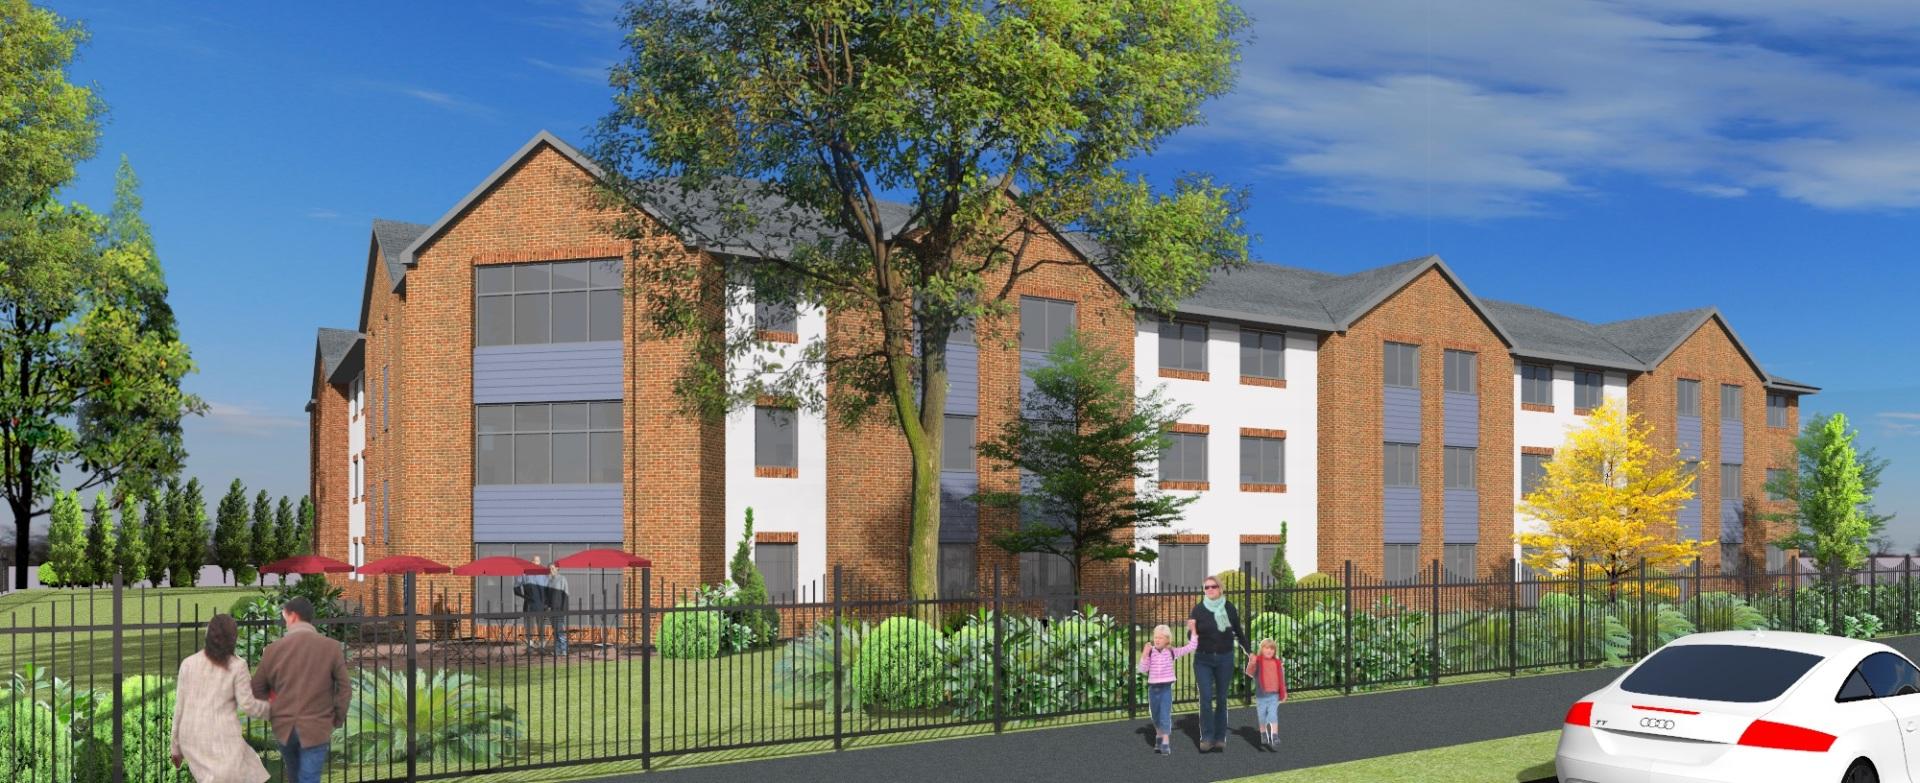 LNT expands care home development